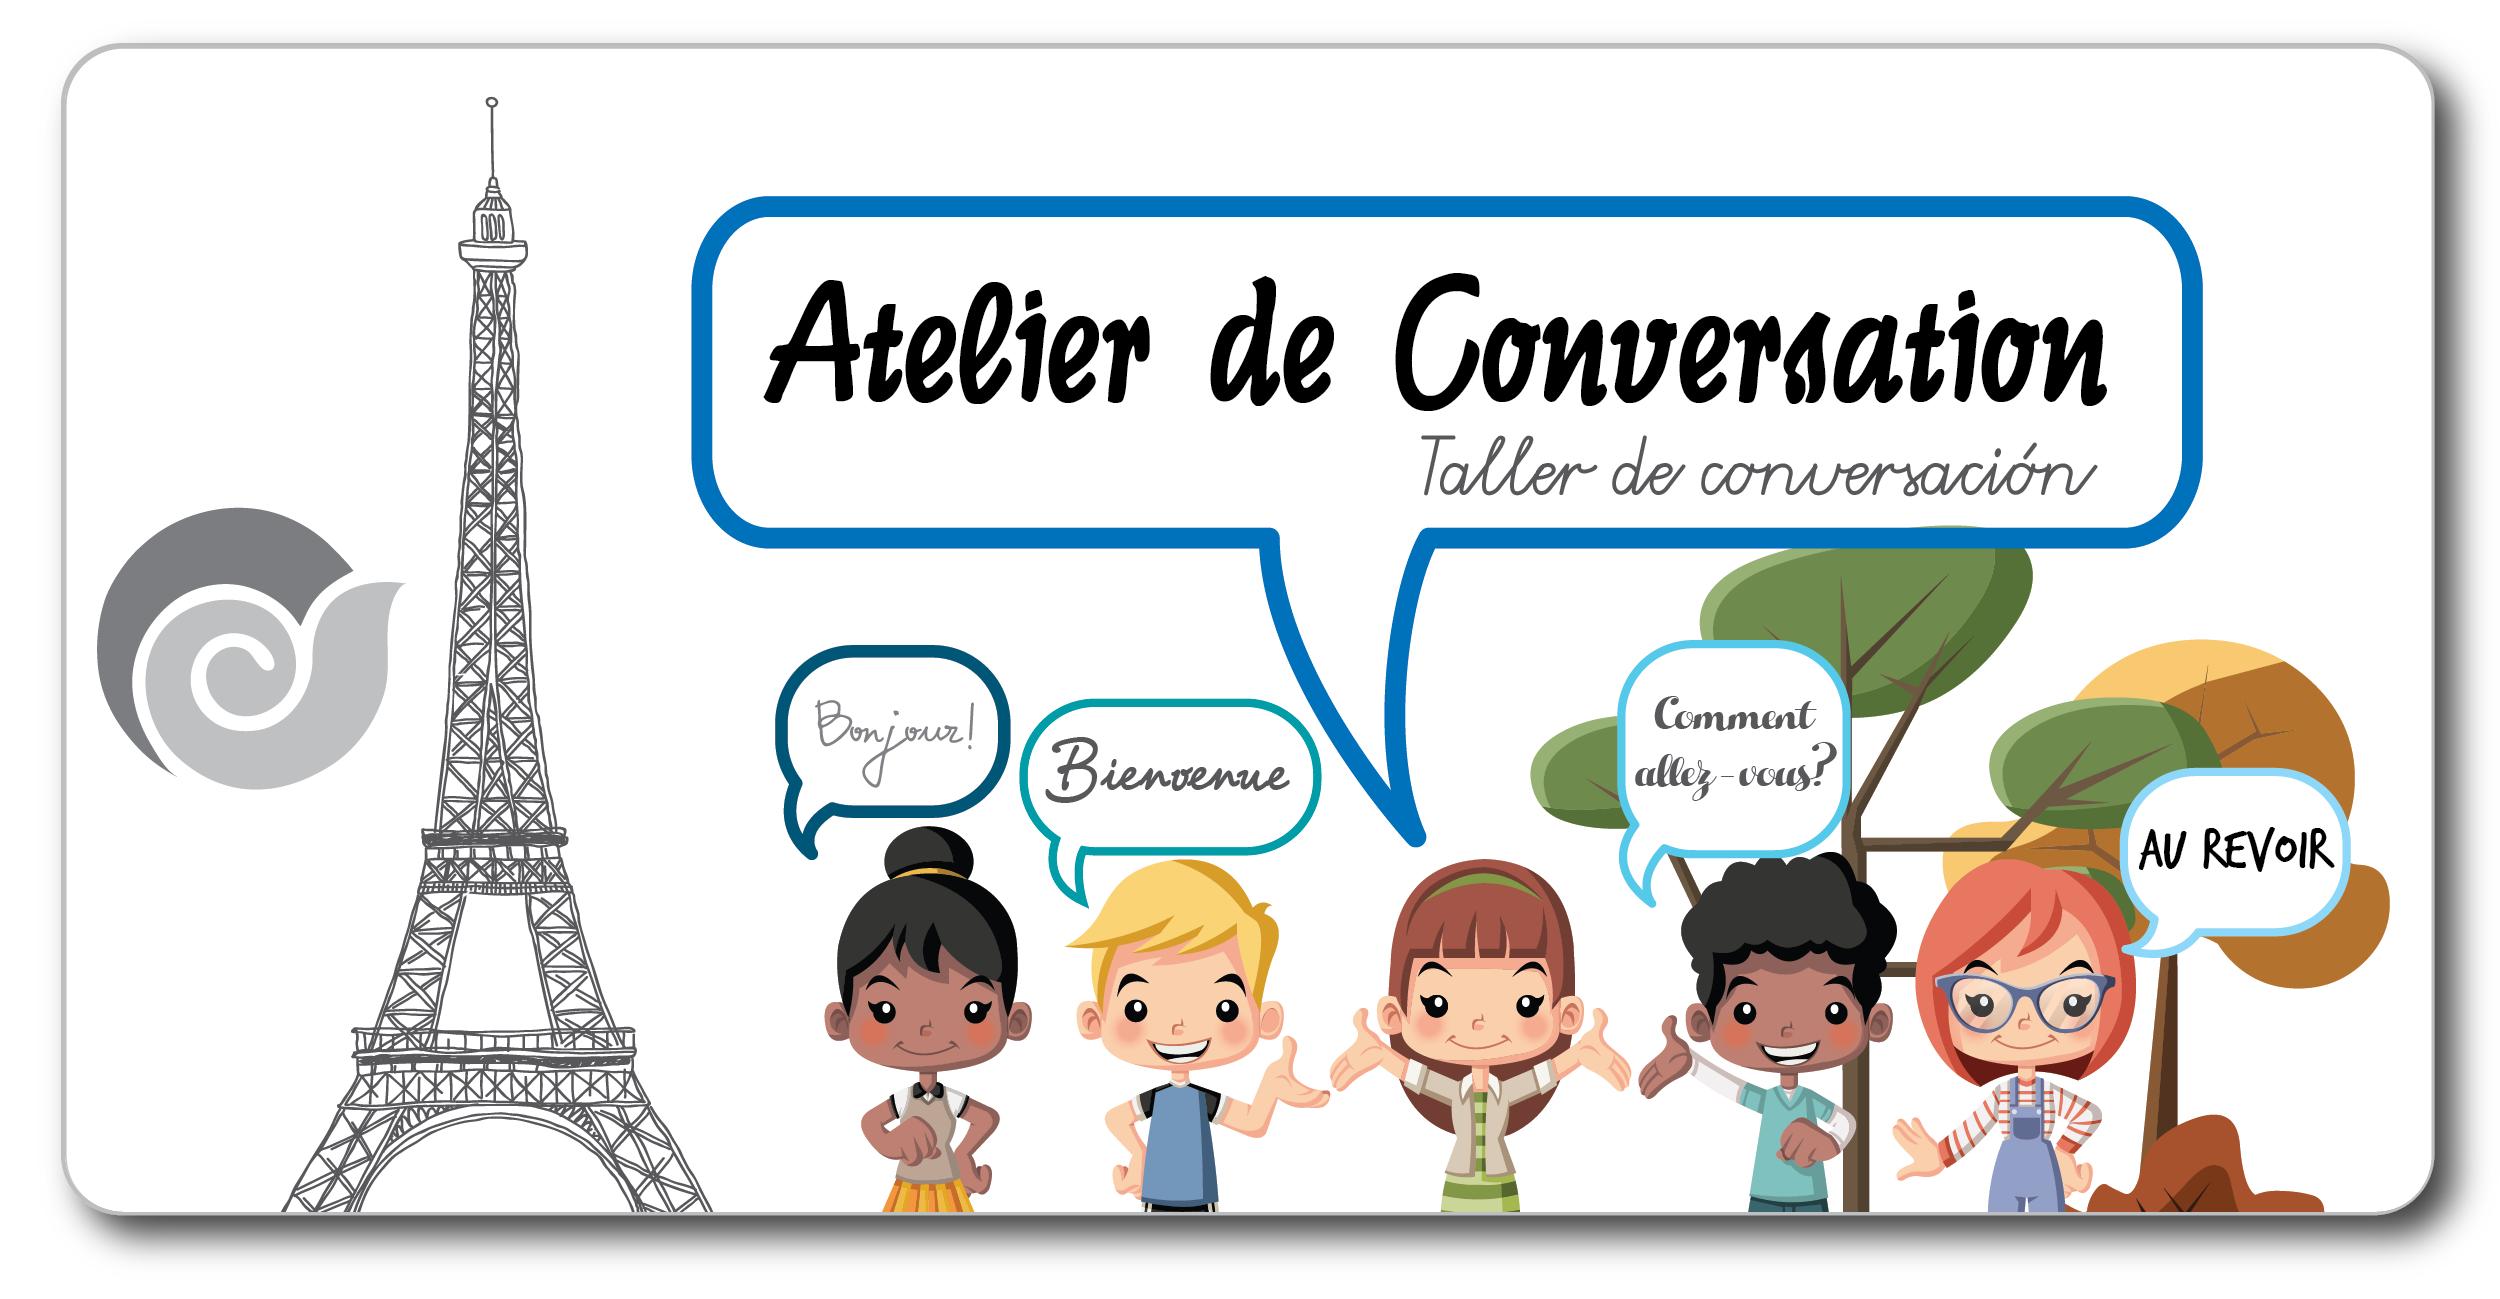 botón conversacion en francés